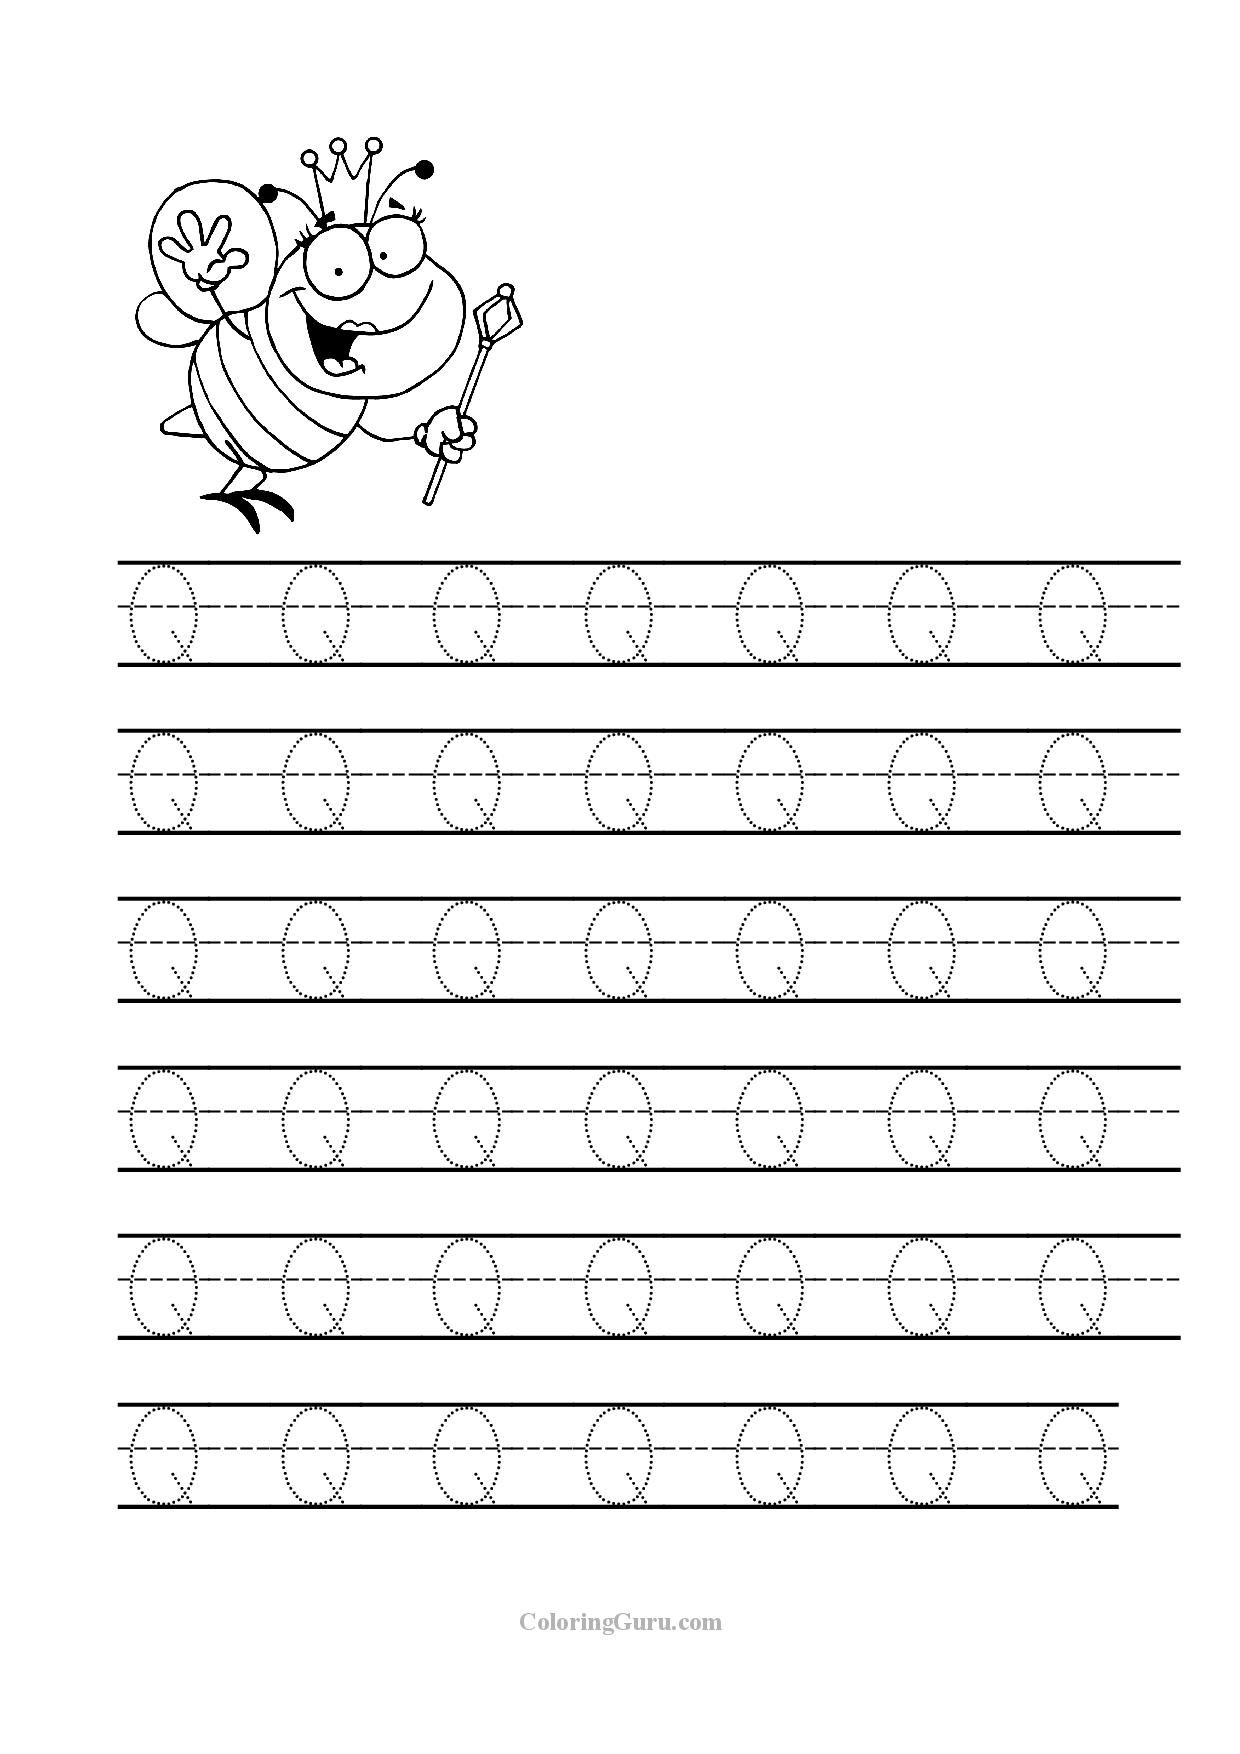 Tracing Letter Q Worksheets